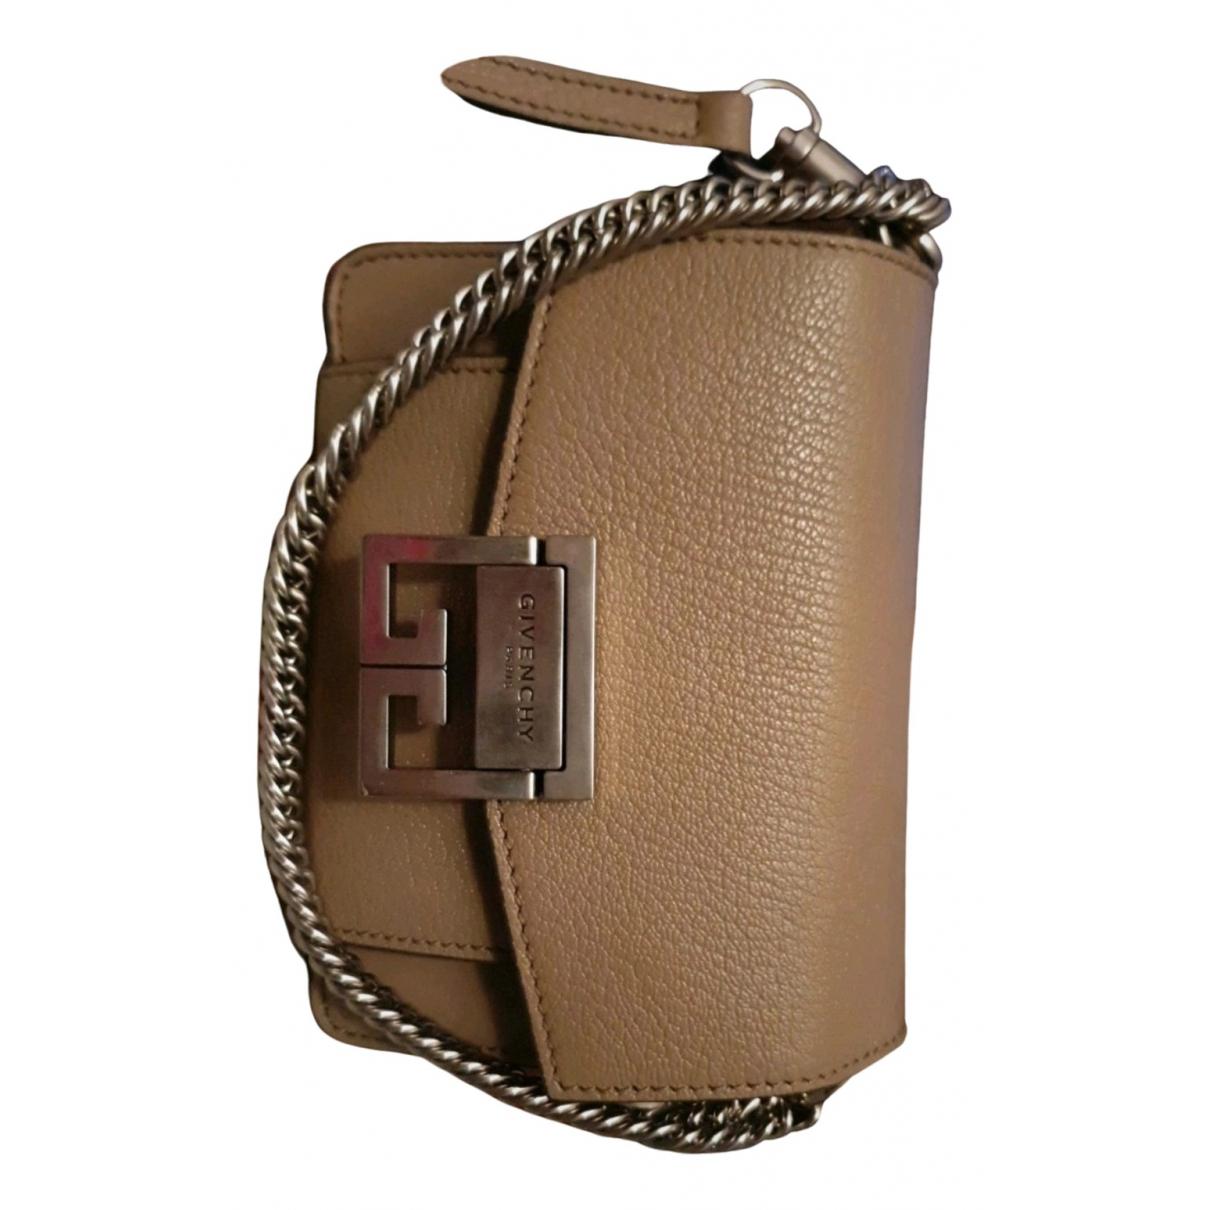 Givenchy GV3 Beige Leather handbag for Women N